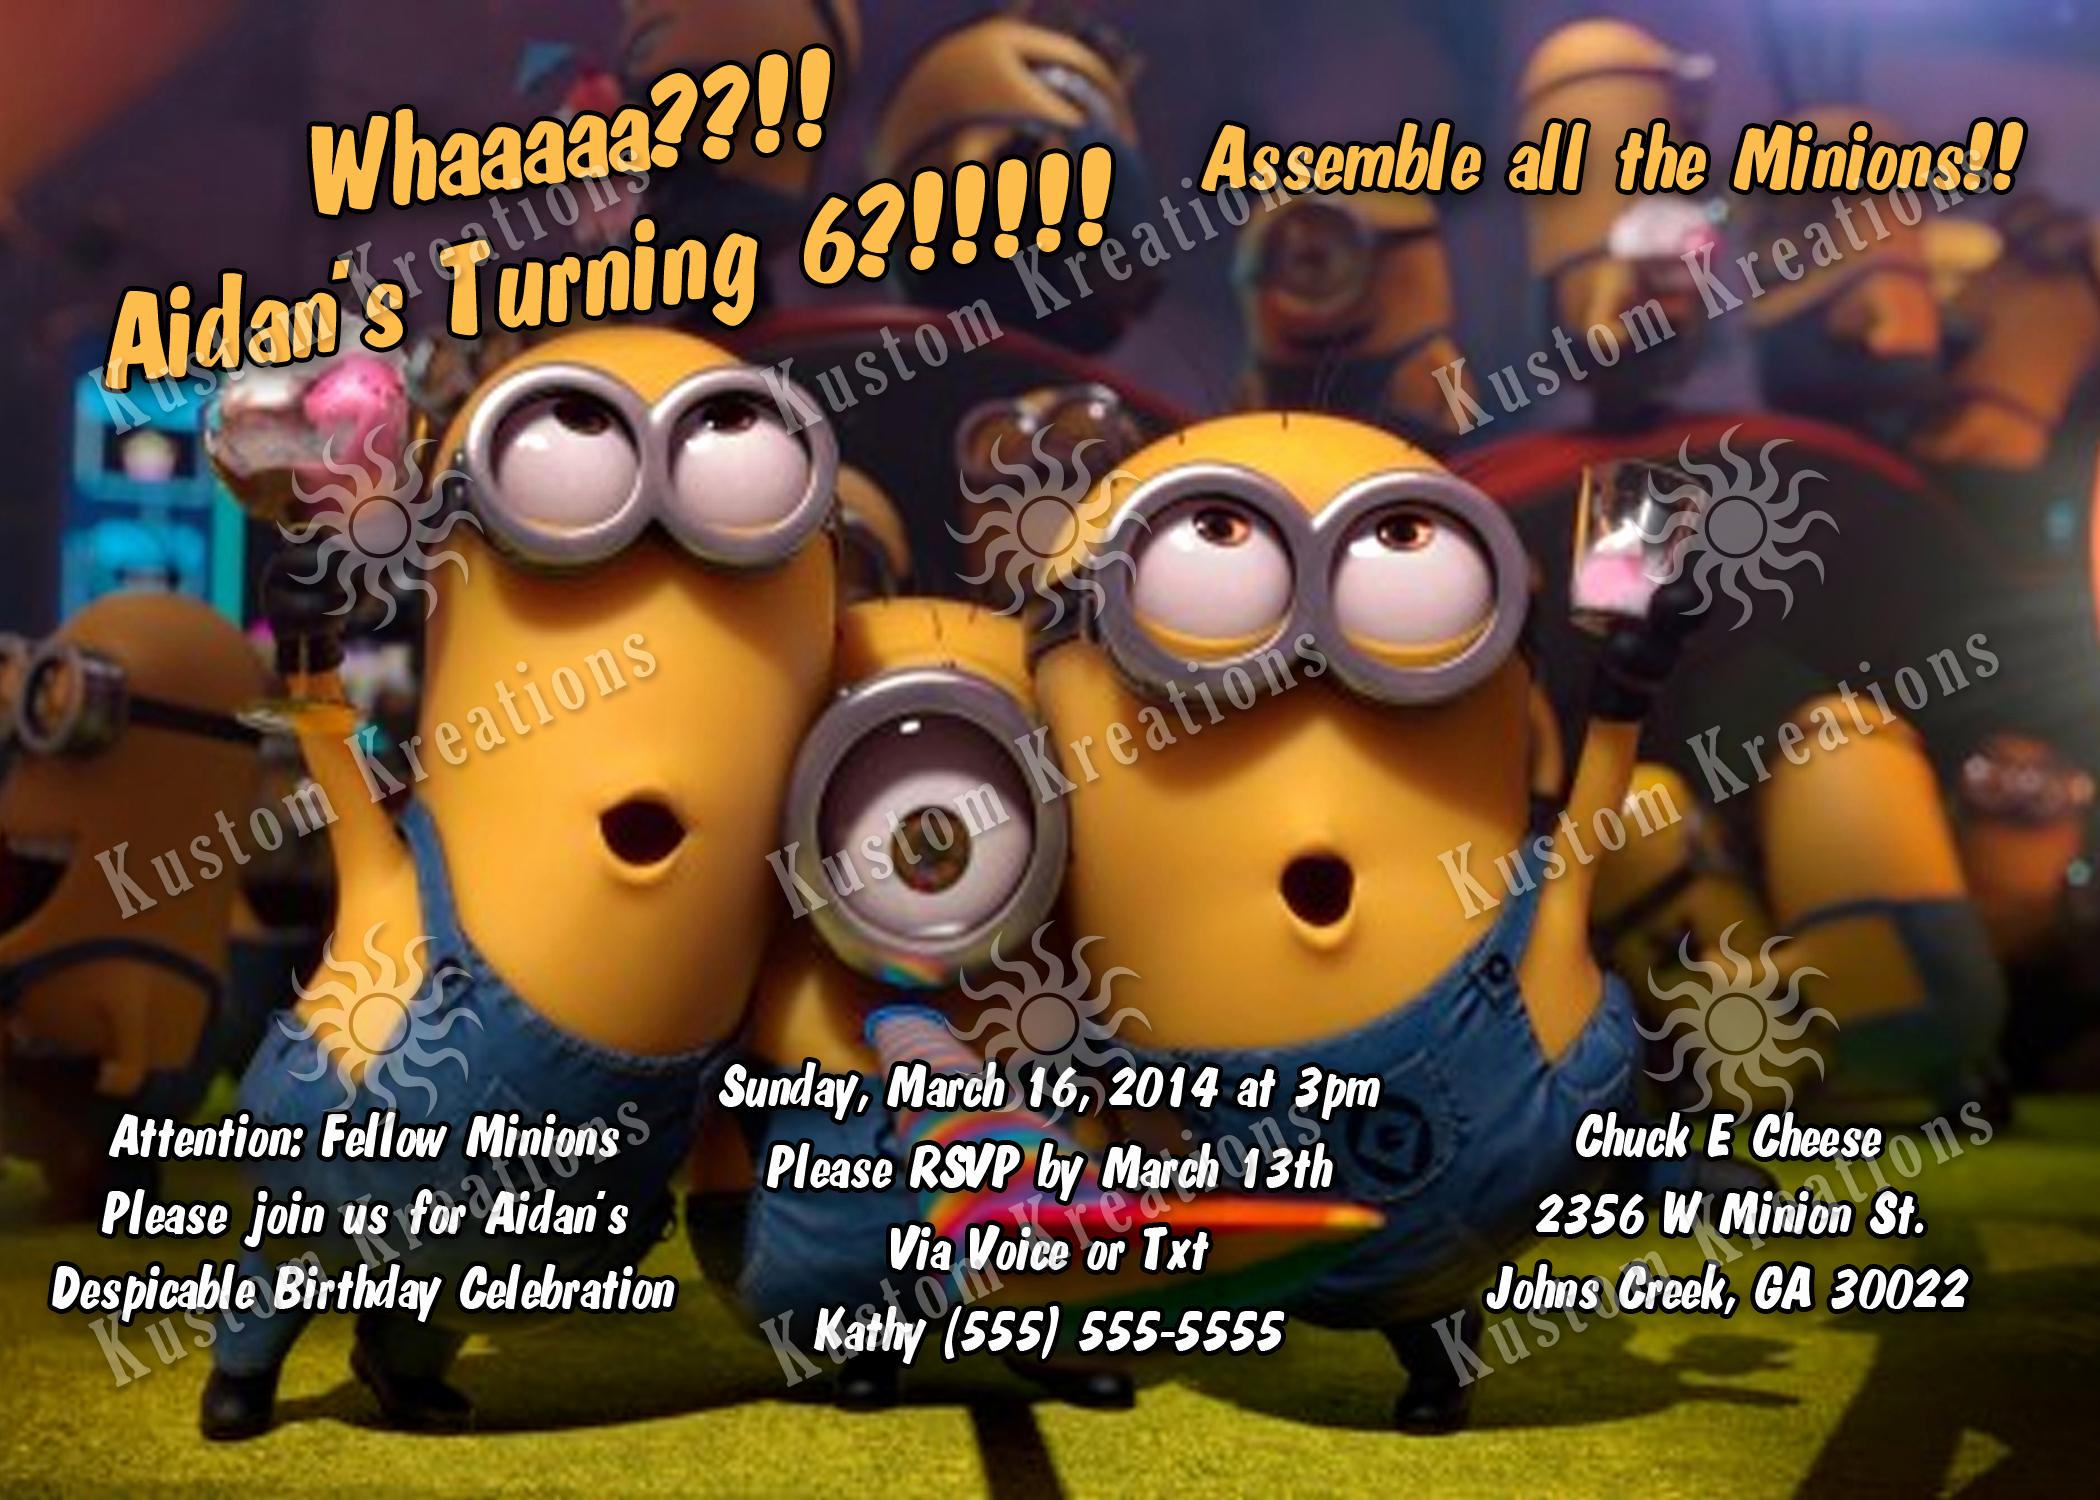 Minions Birthday Party Invitation Luxury Minions Birthday Invitations